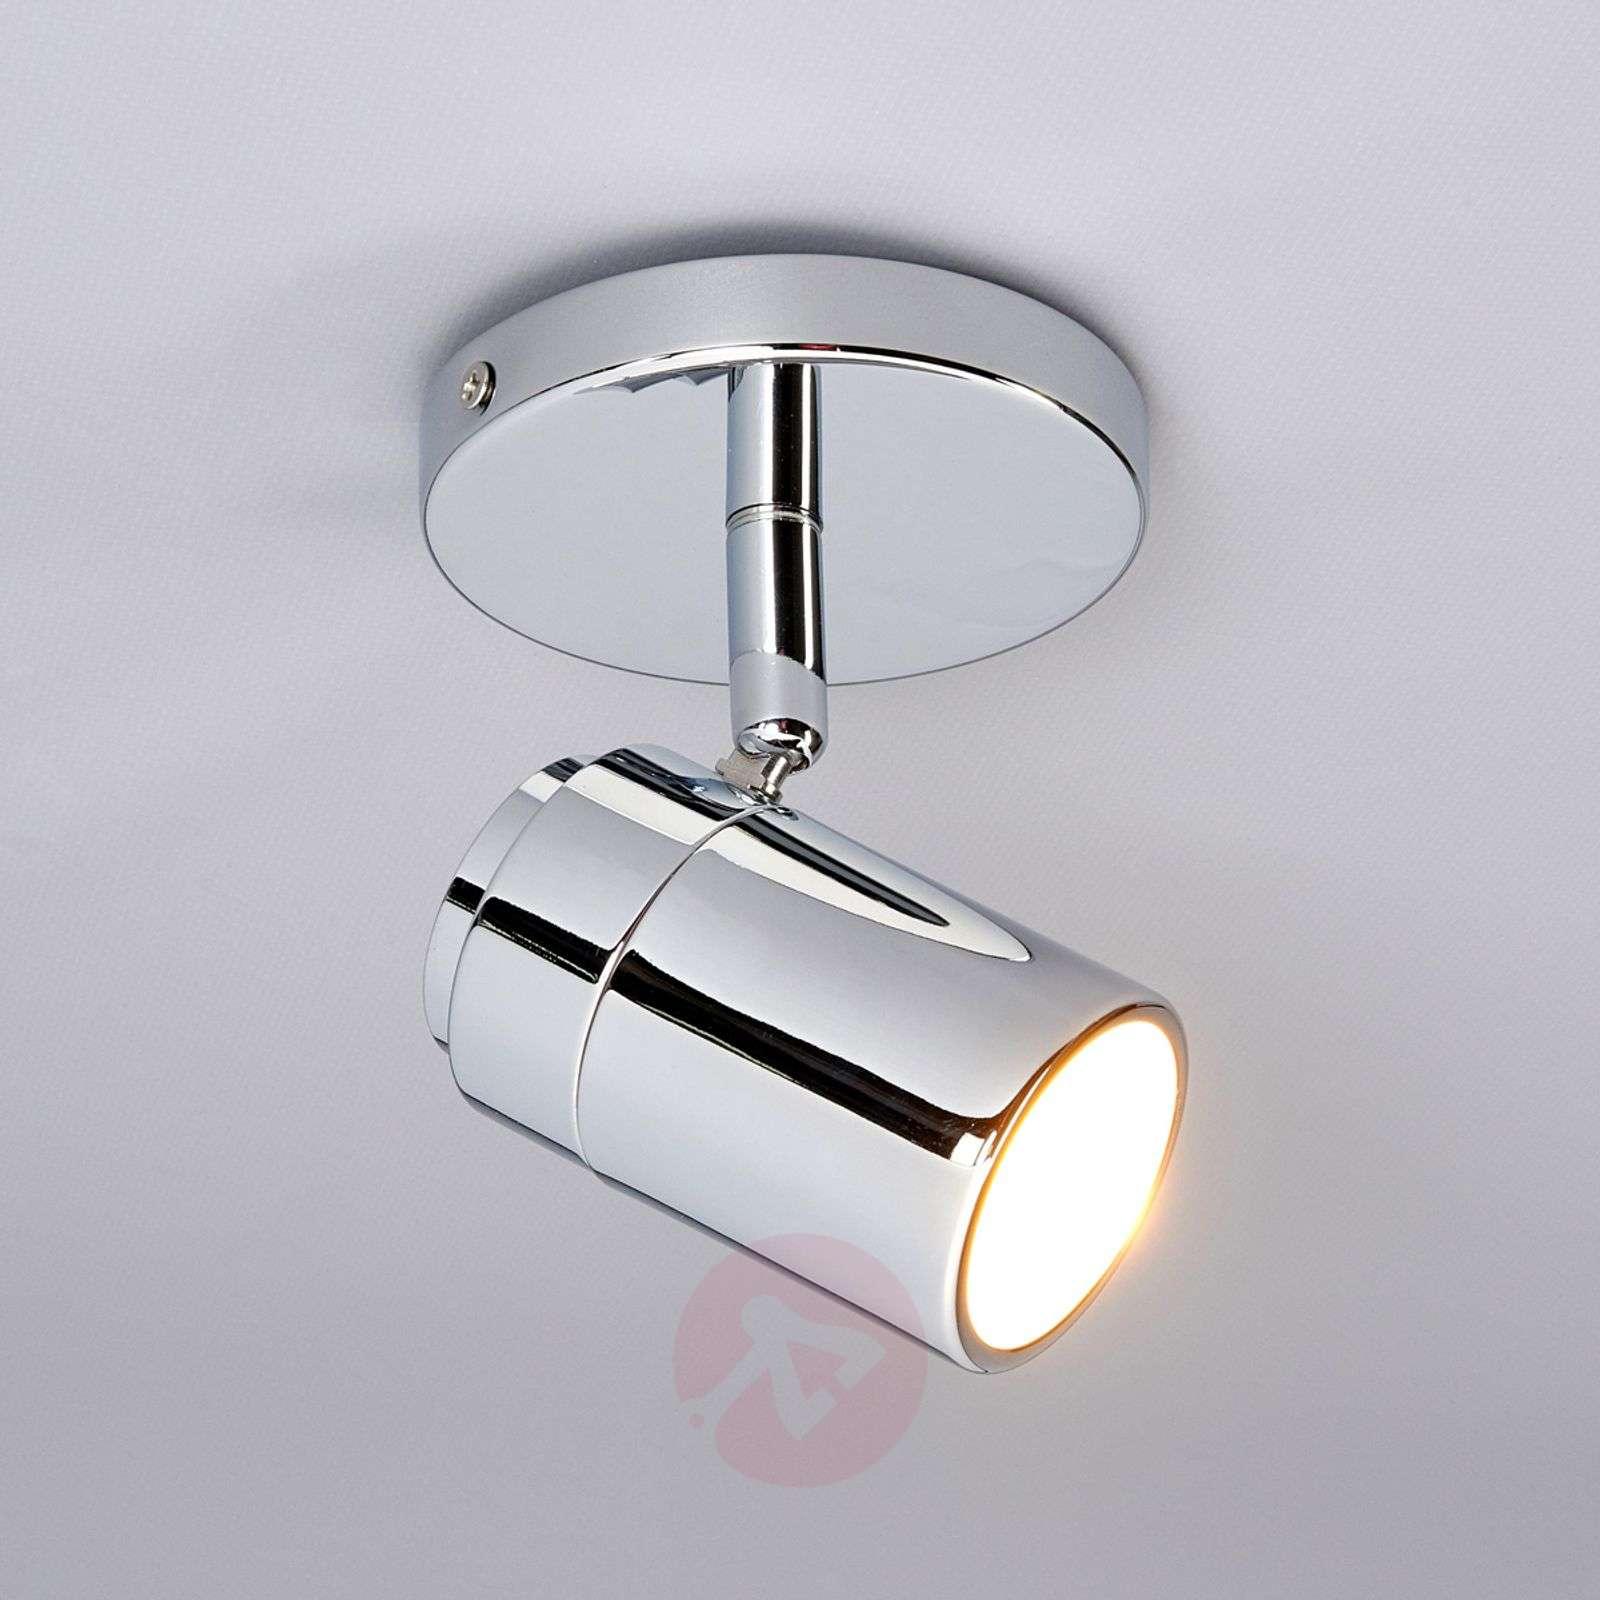 Dejan ceiling and wall spotlight, chrome-9641022-04